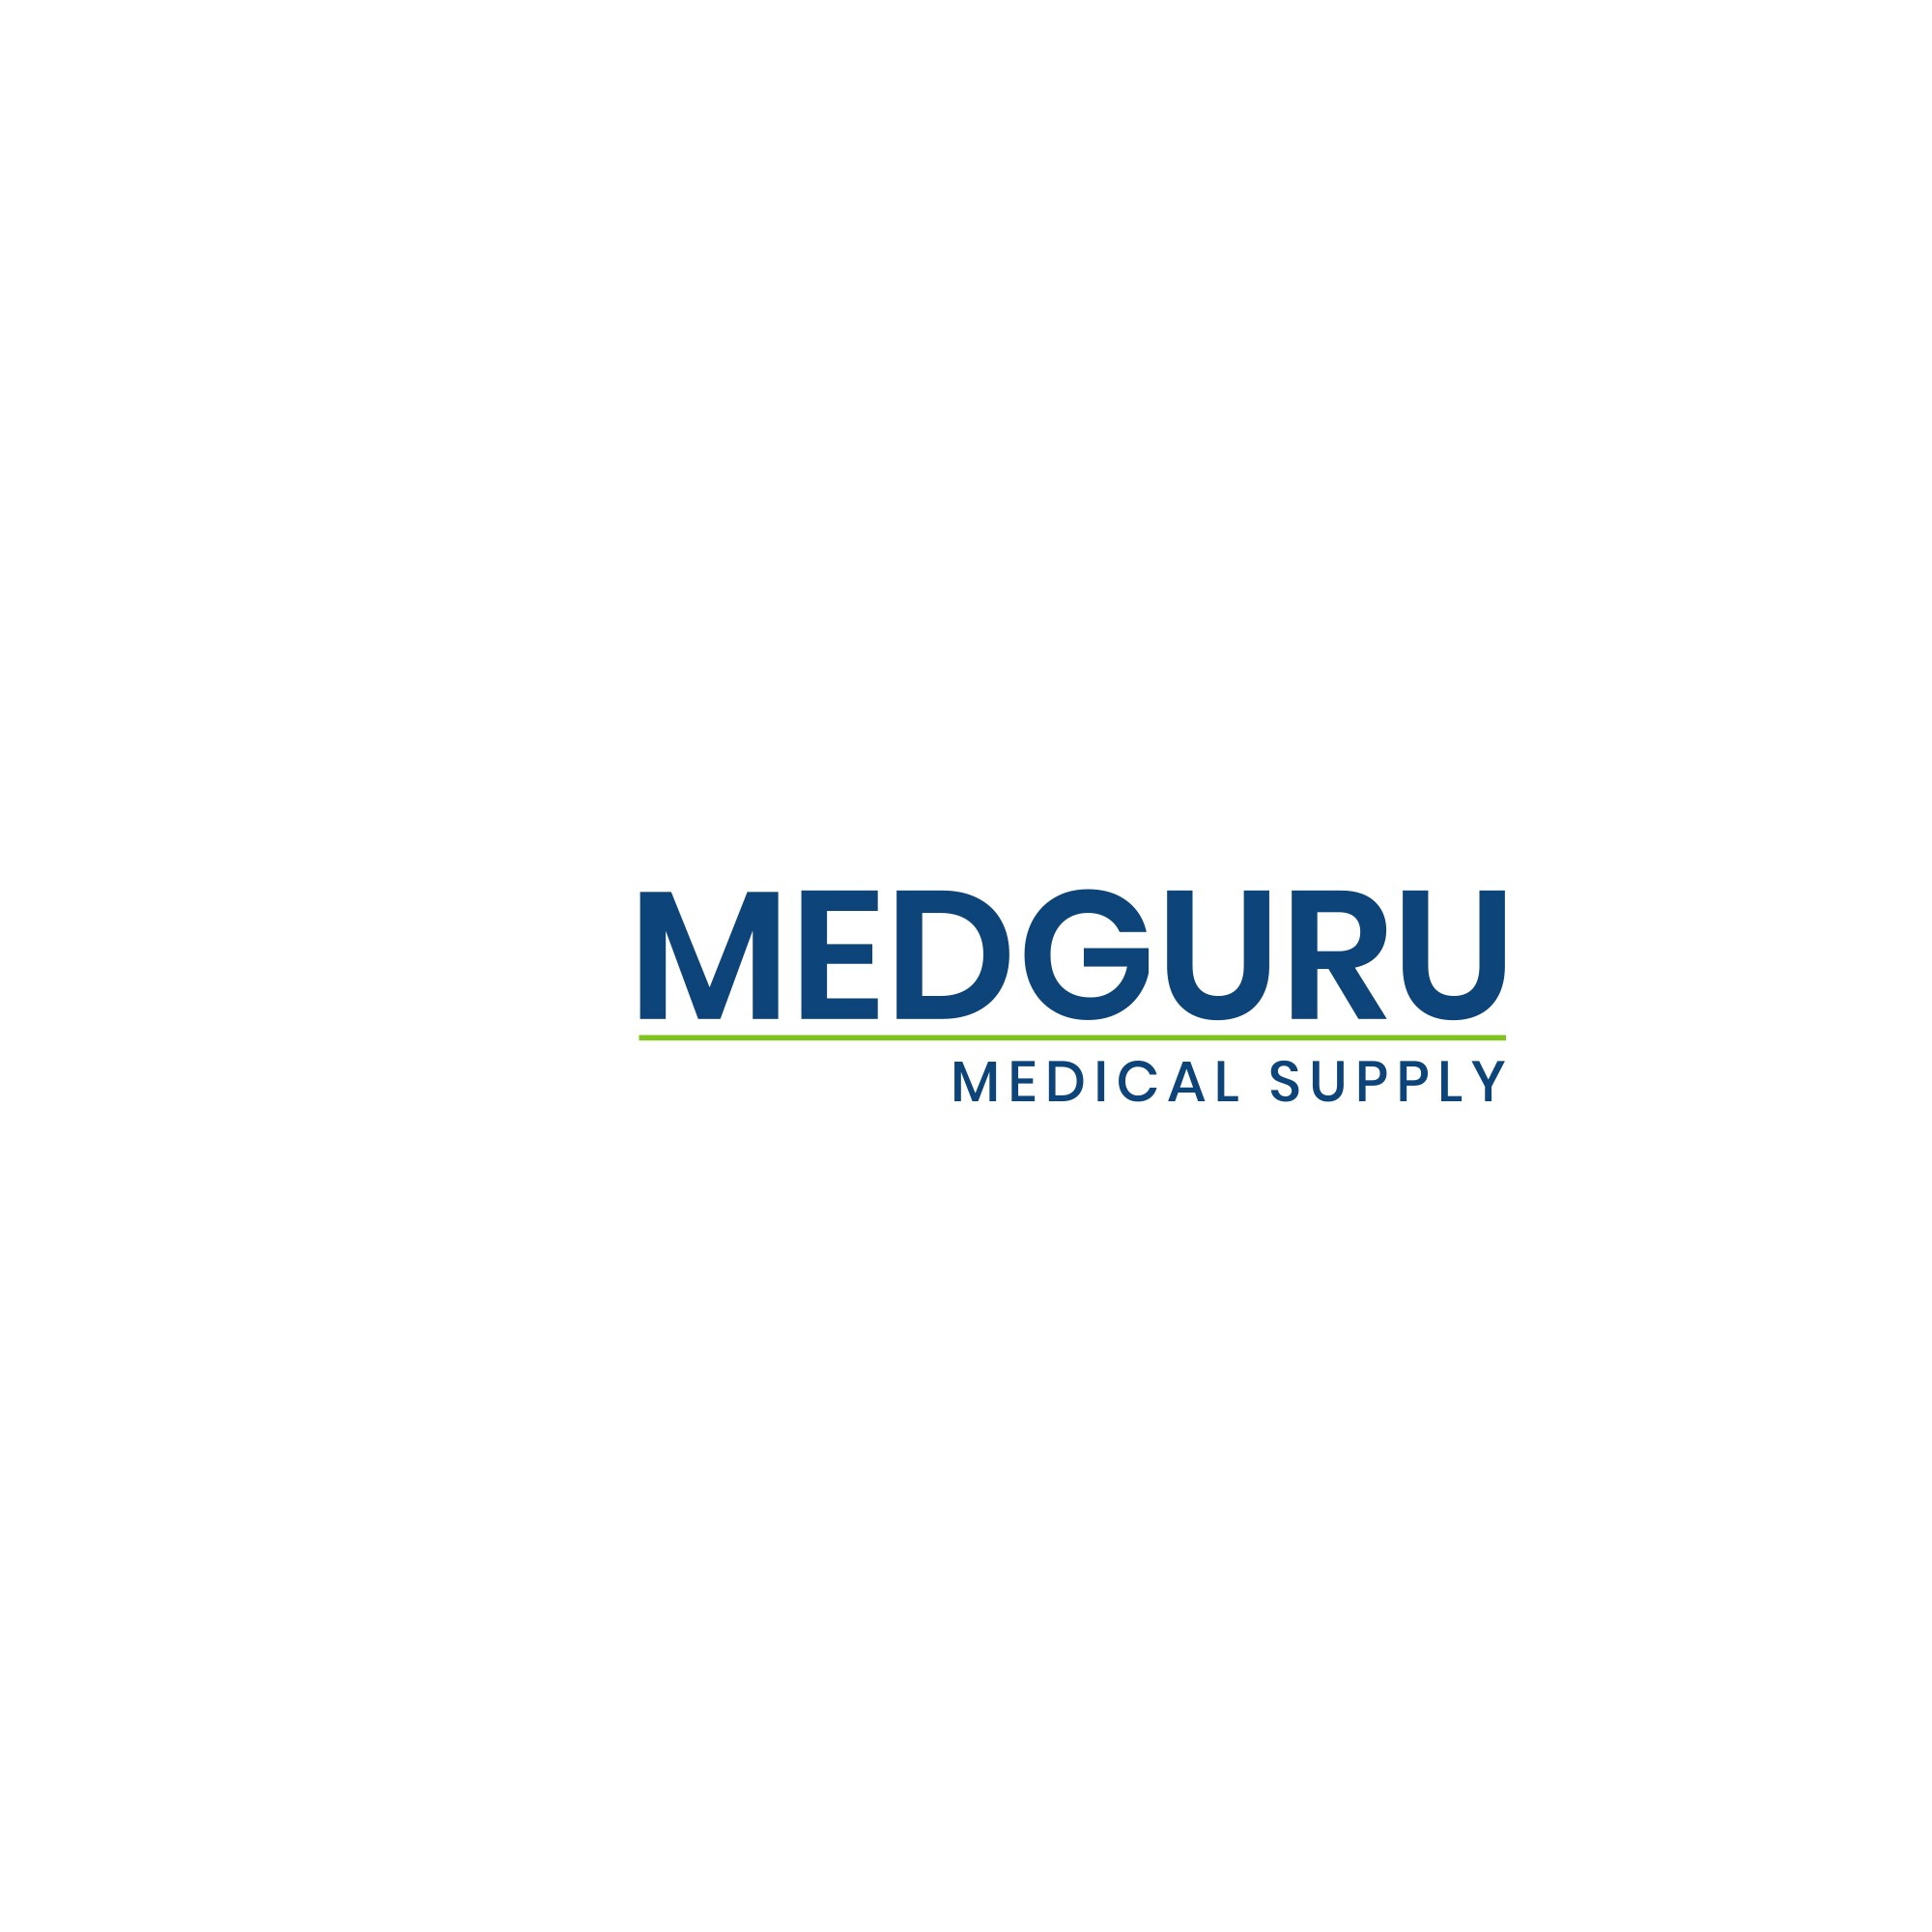 Medguru Medical Supply